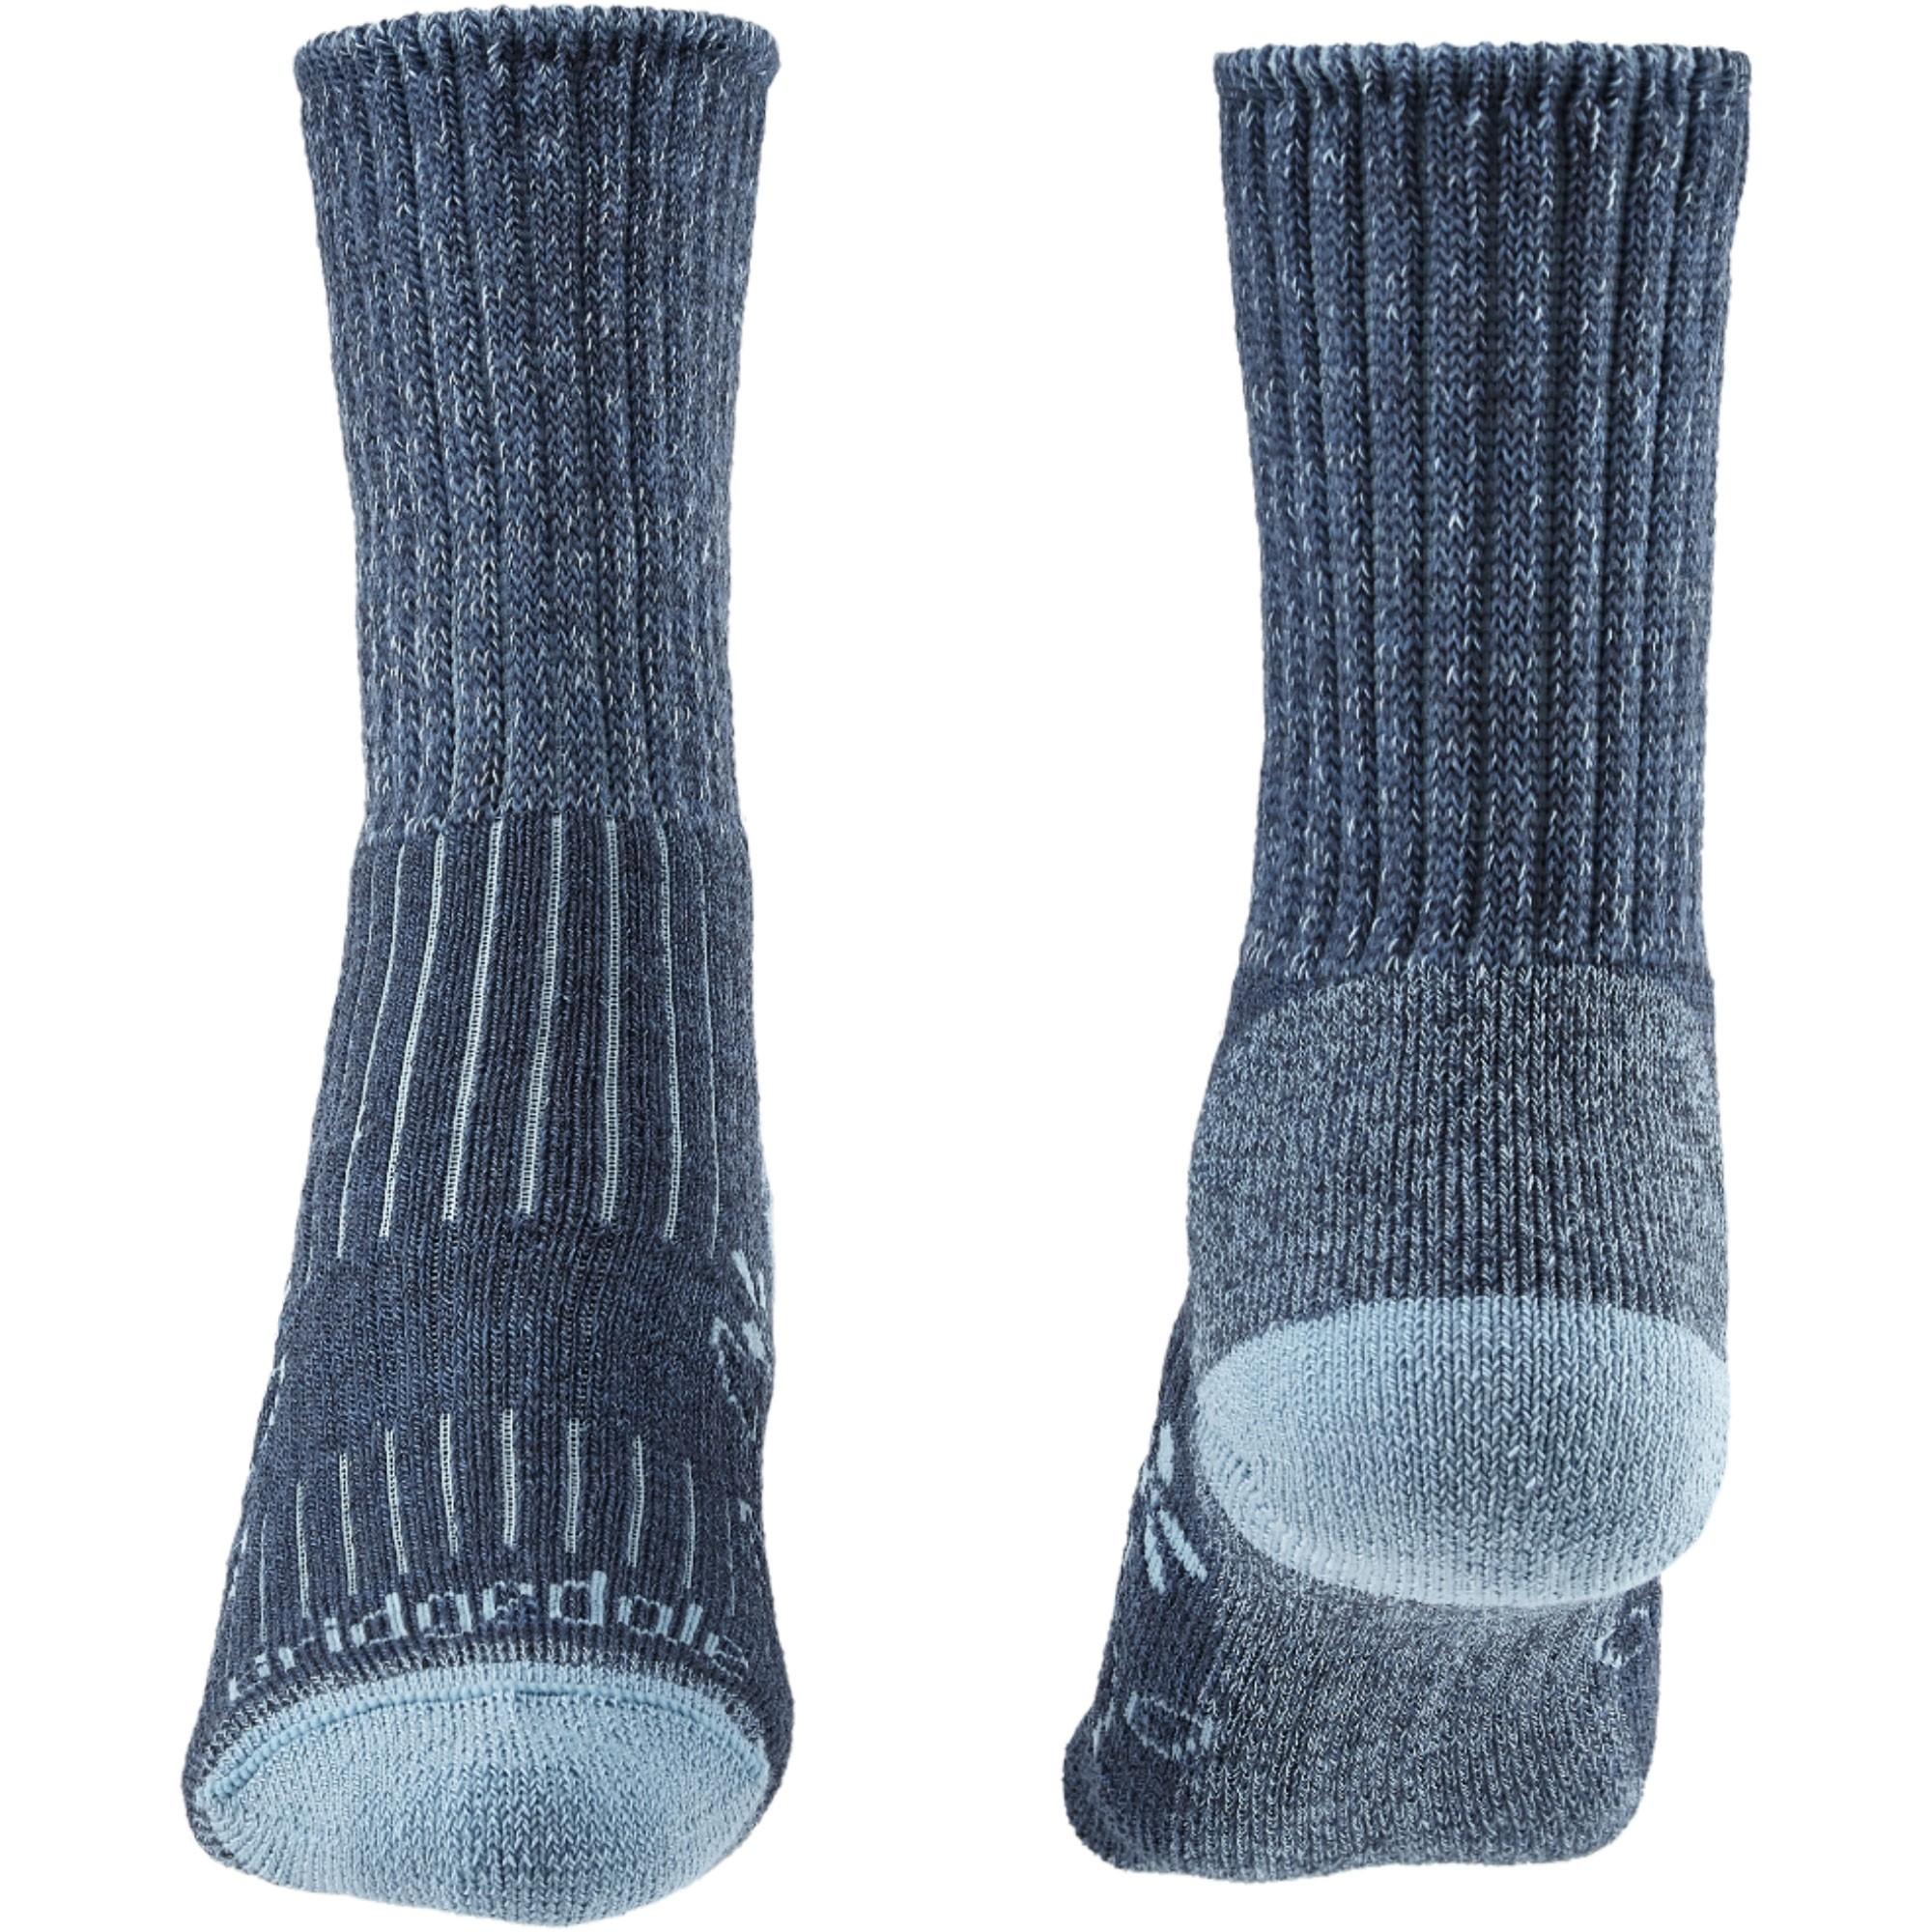 Bridgedale Hike Midweight Merino Comfort Women's Socks - Blue